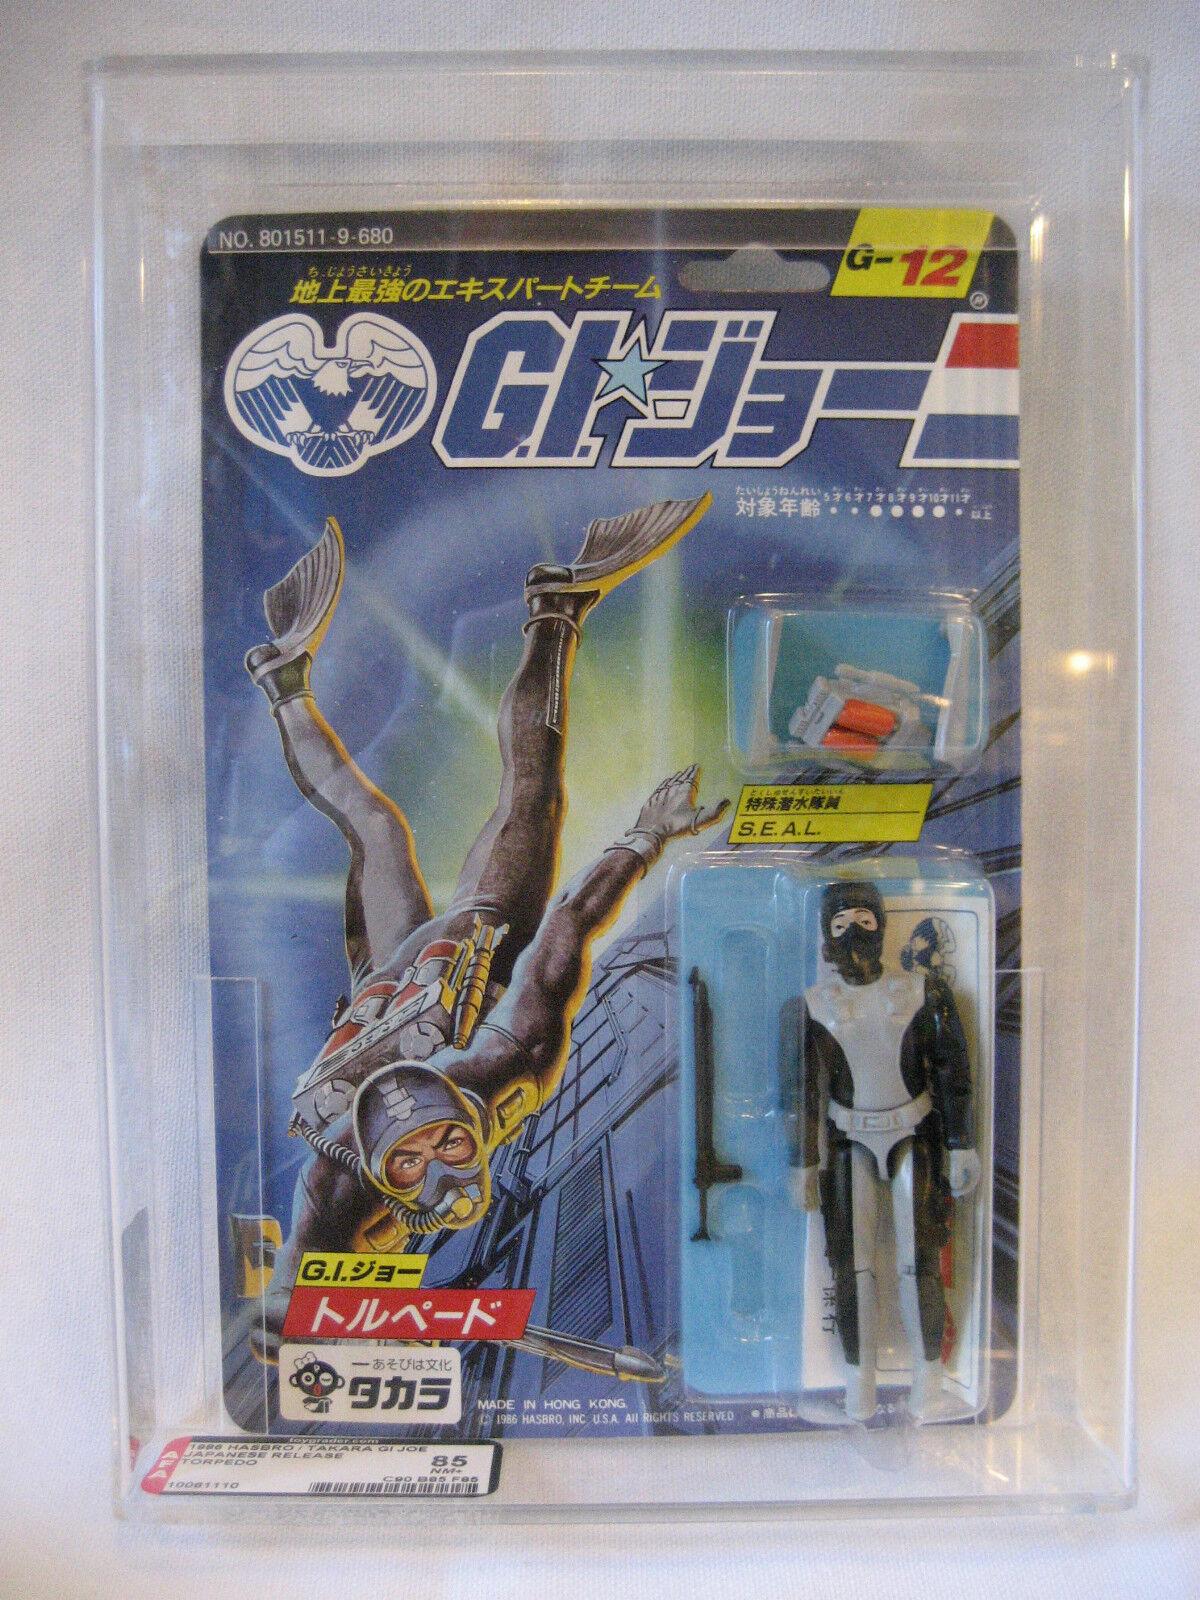 AFA 85 Hasbro GI Joe TORPEDO Takara MOC action figure 1986 Japanese G.I. Joe toy